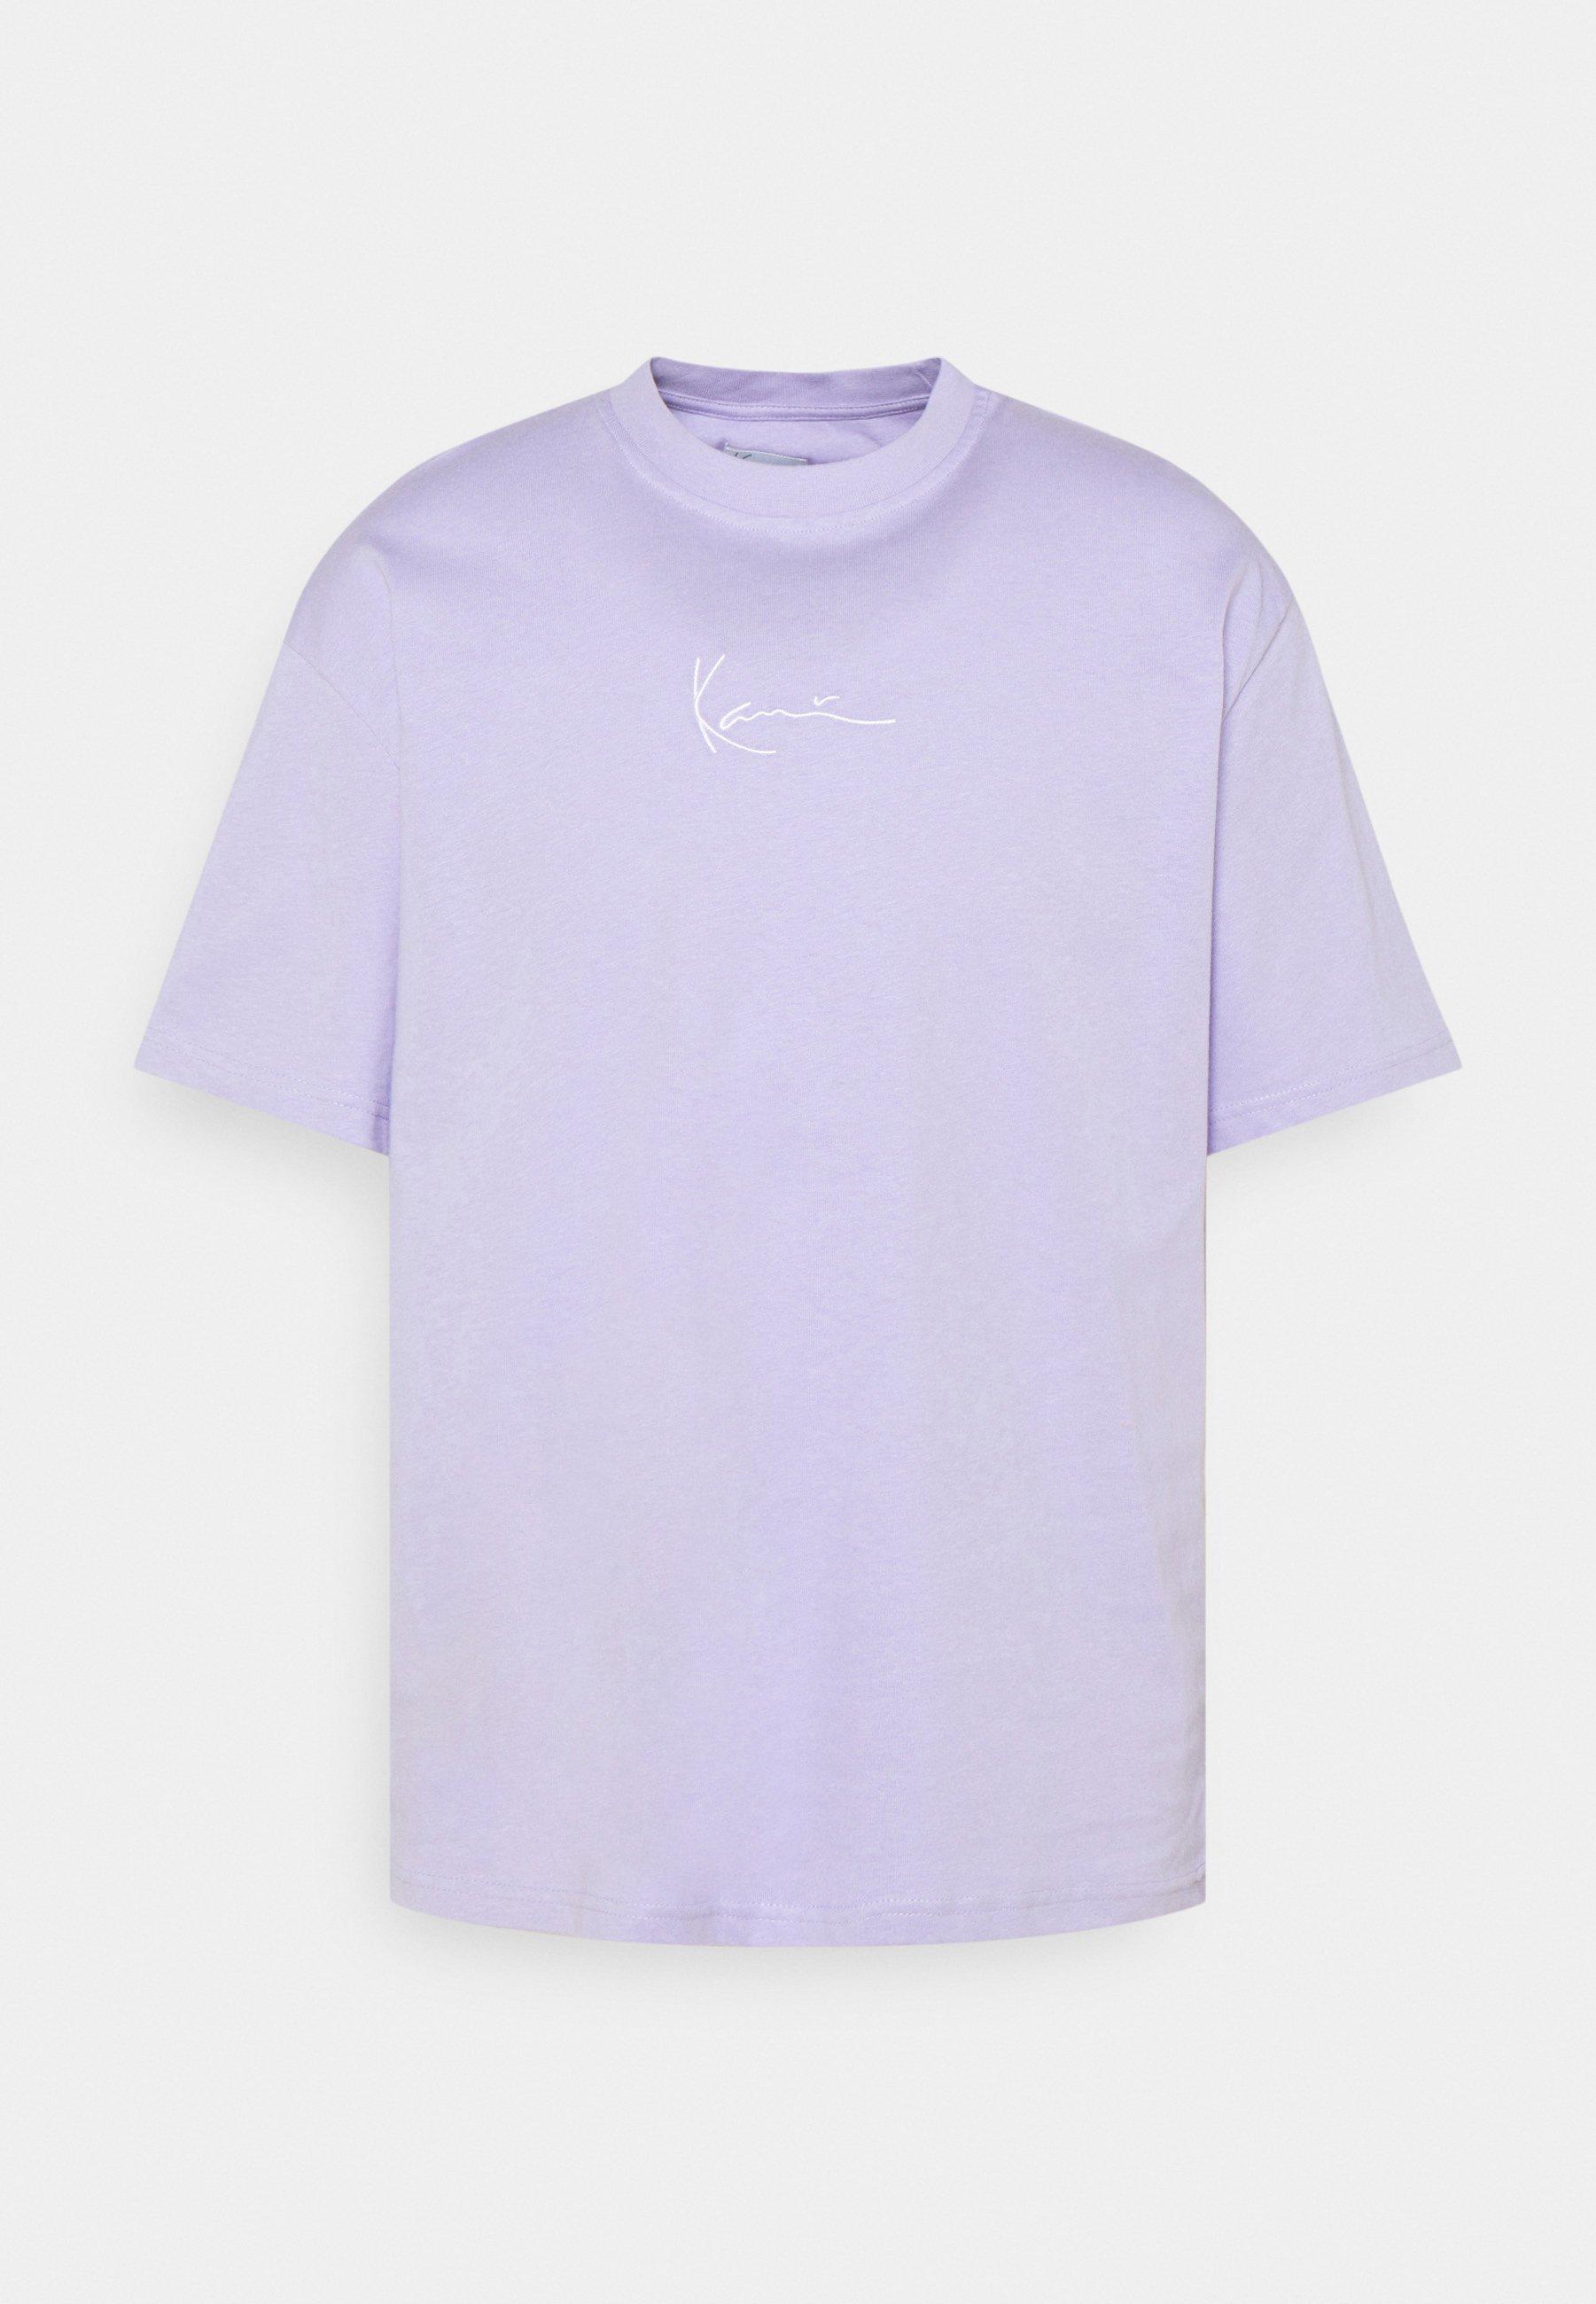 Women UNISEX SMALL SIGNATURE ESSENTIAL TEE - Basic T-shirt